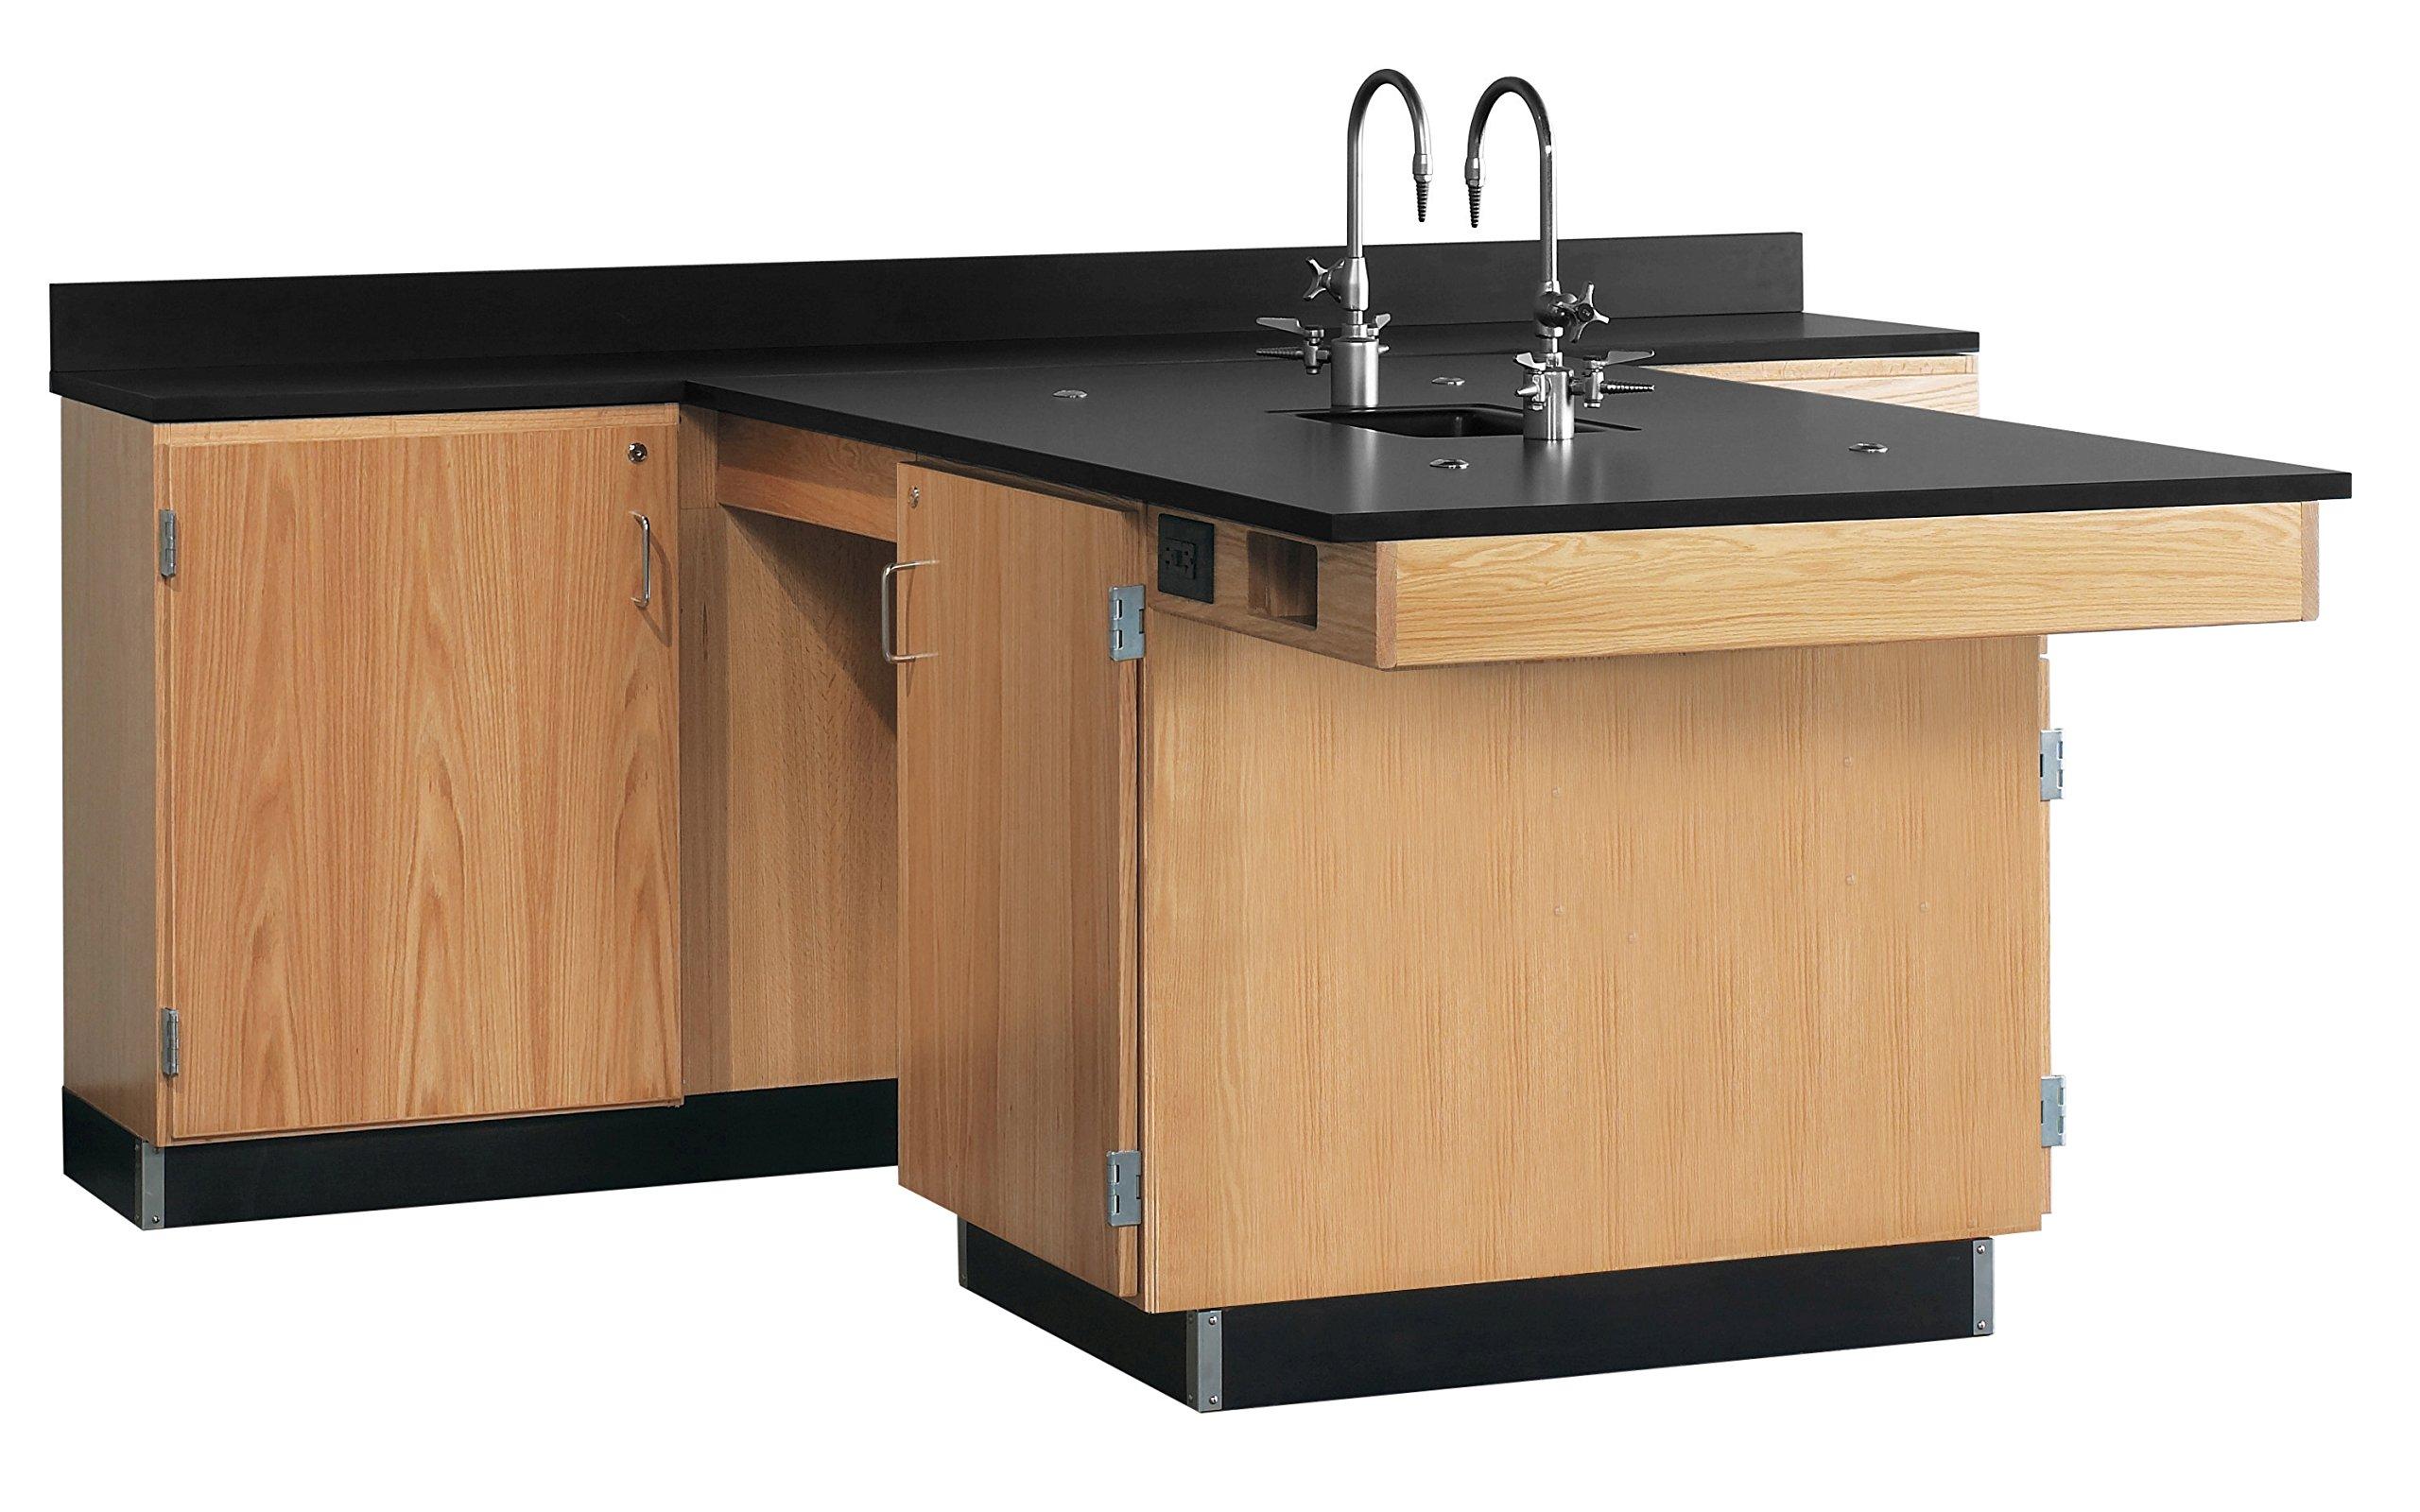 Diversified Woodcrafts 2816K Solid Oak Wood Perimeter Workstation with 1 Door, Epoxy Resin Top, 90'' Width x 36'' Height x 84'' Depth by Diversified Woodcrafts